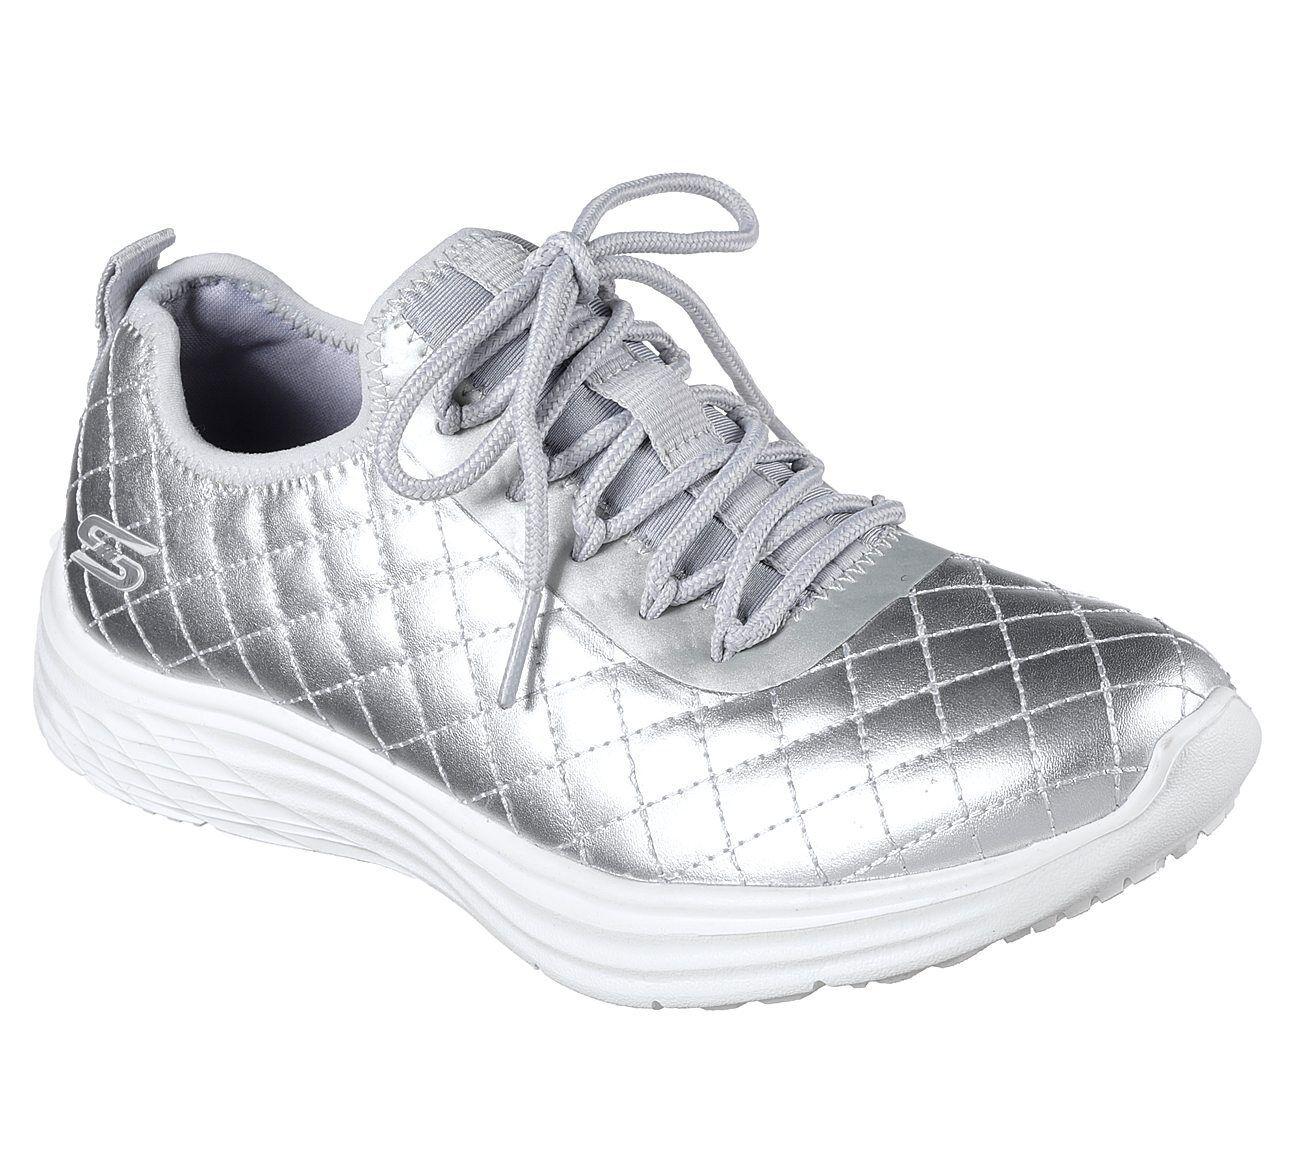 NEU SKECHERS Damen Sneakers Turnschuhe BOBS SWIFT - SOCIAL SOCIAL SOCIAL H TLE Silber b9ba50